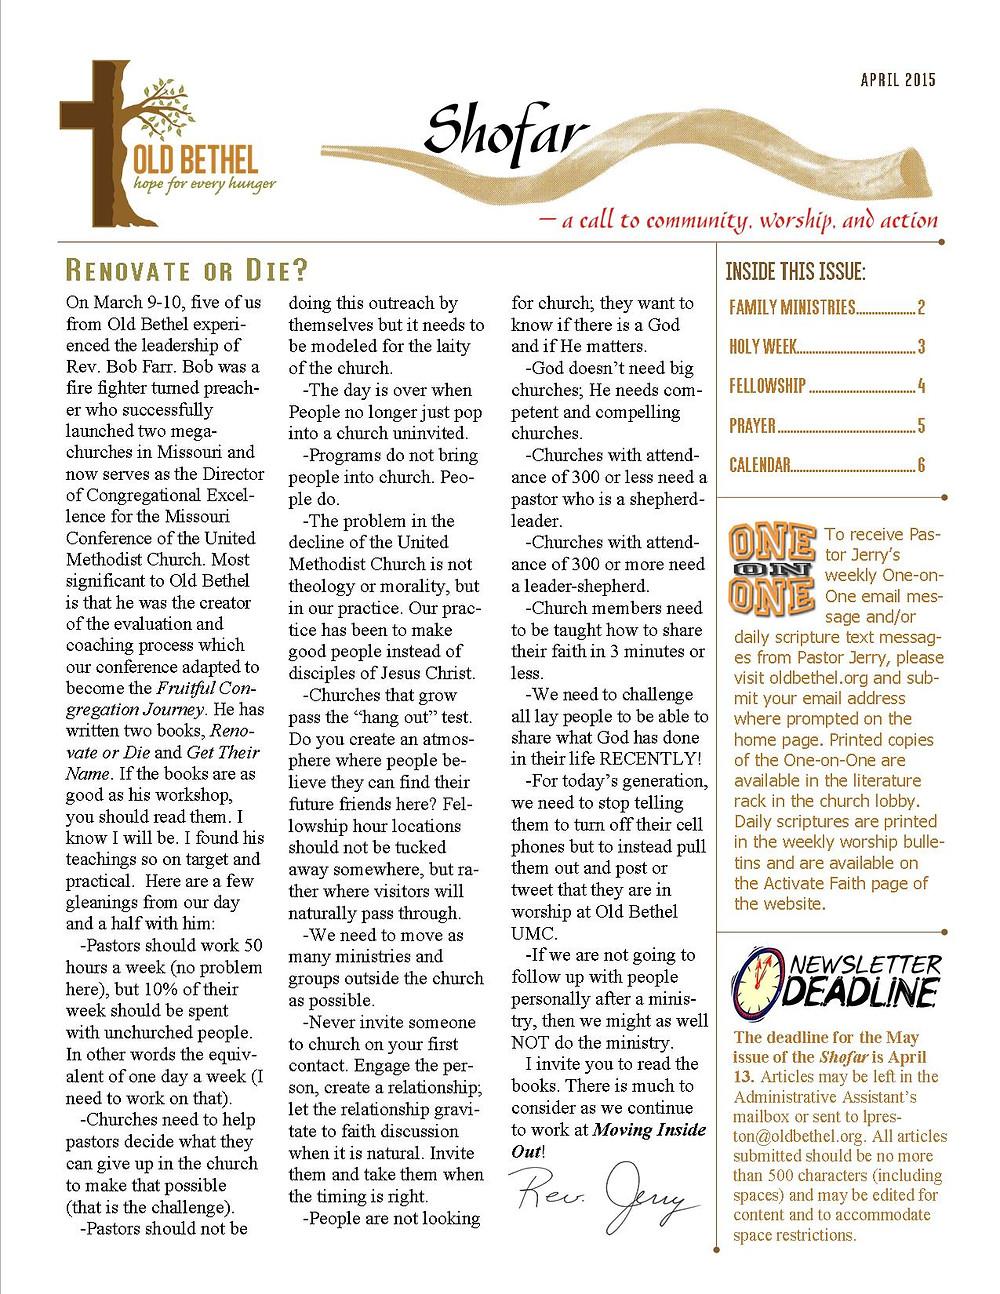 04 April Shofar 2015 page 1.jpg